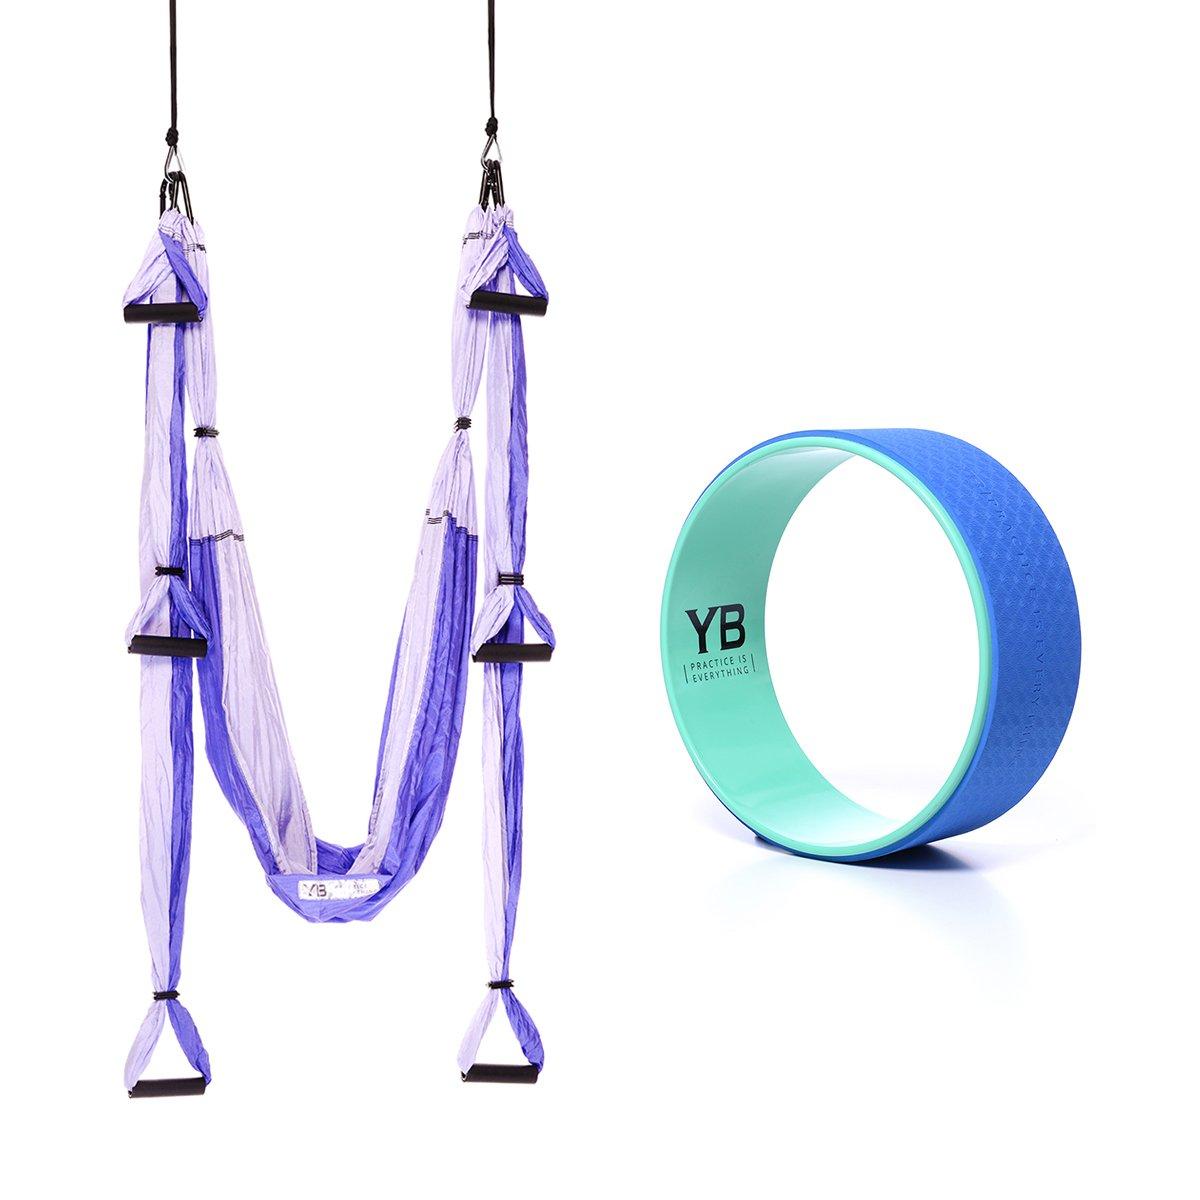 Bundle - 2 Items: Yoga Trapeze Purple & Yoga Wonder Wheel Blue [Bundle] - By YOGABODY - with 2 Free DVD